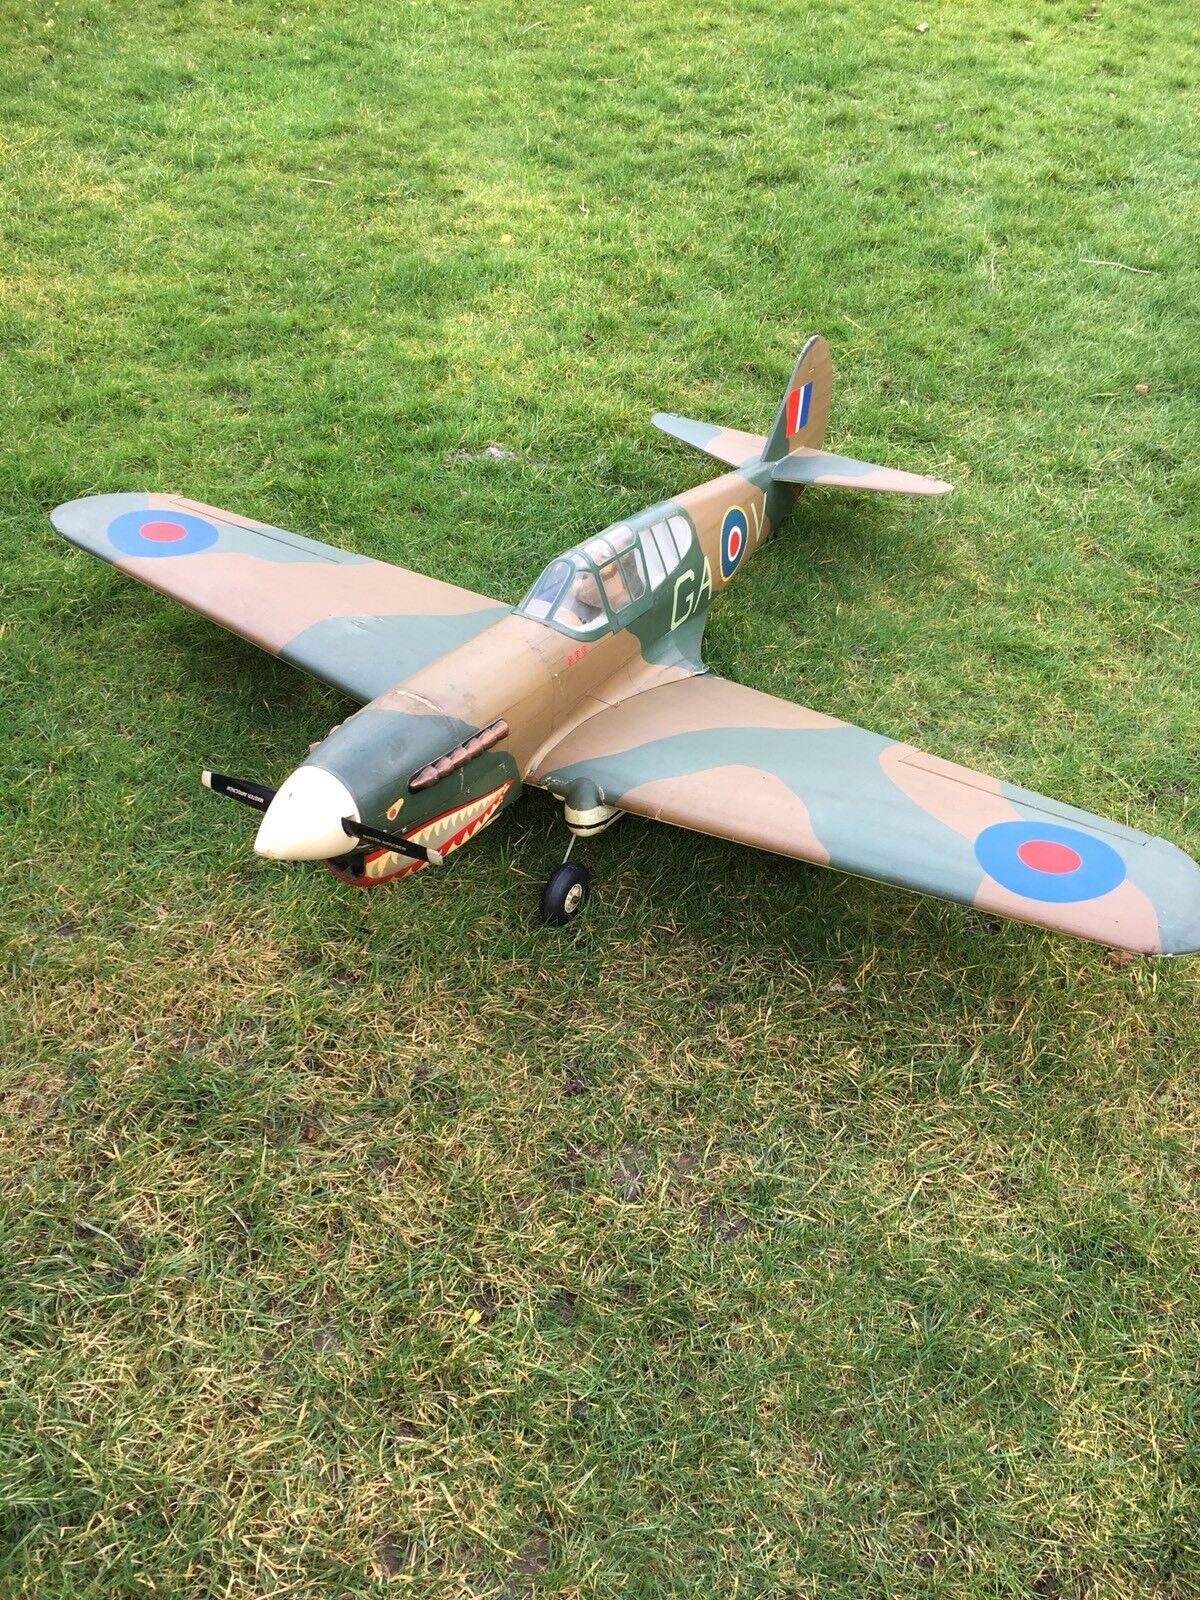 P40 CURTISS WARHAWK RADIO CONTROLLED AIRCRAFT